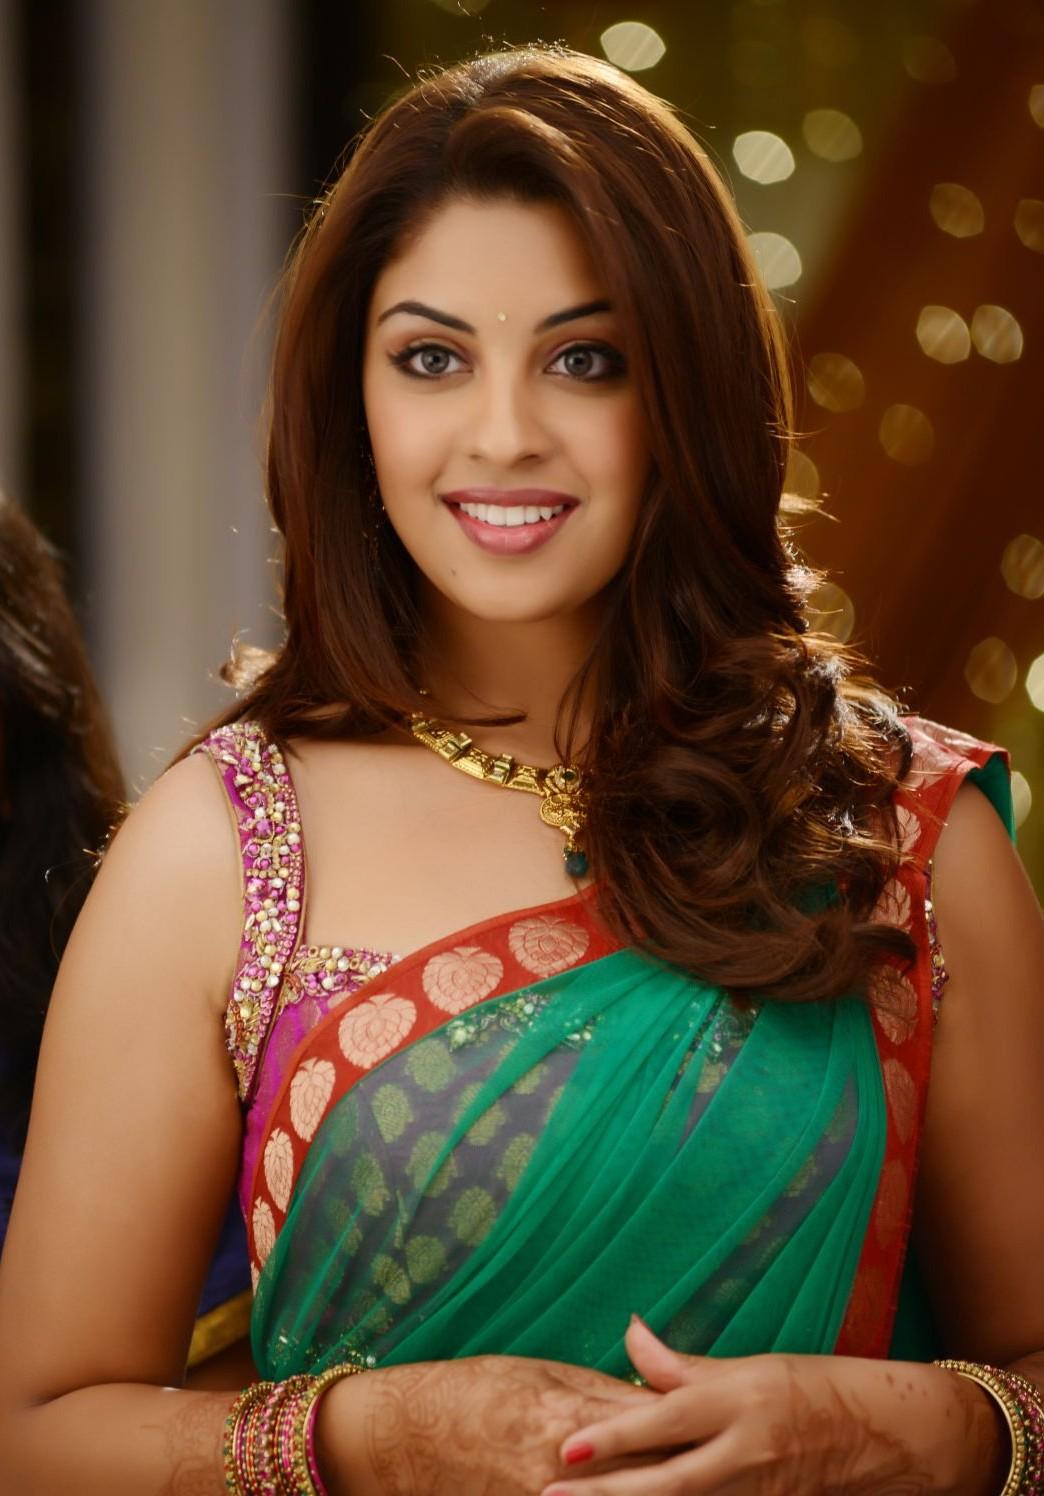 richa gangopadhyay in saree from telugu movie electrihot